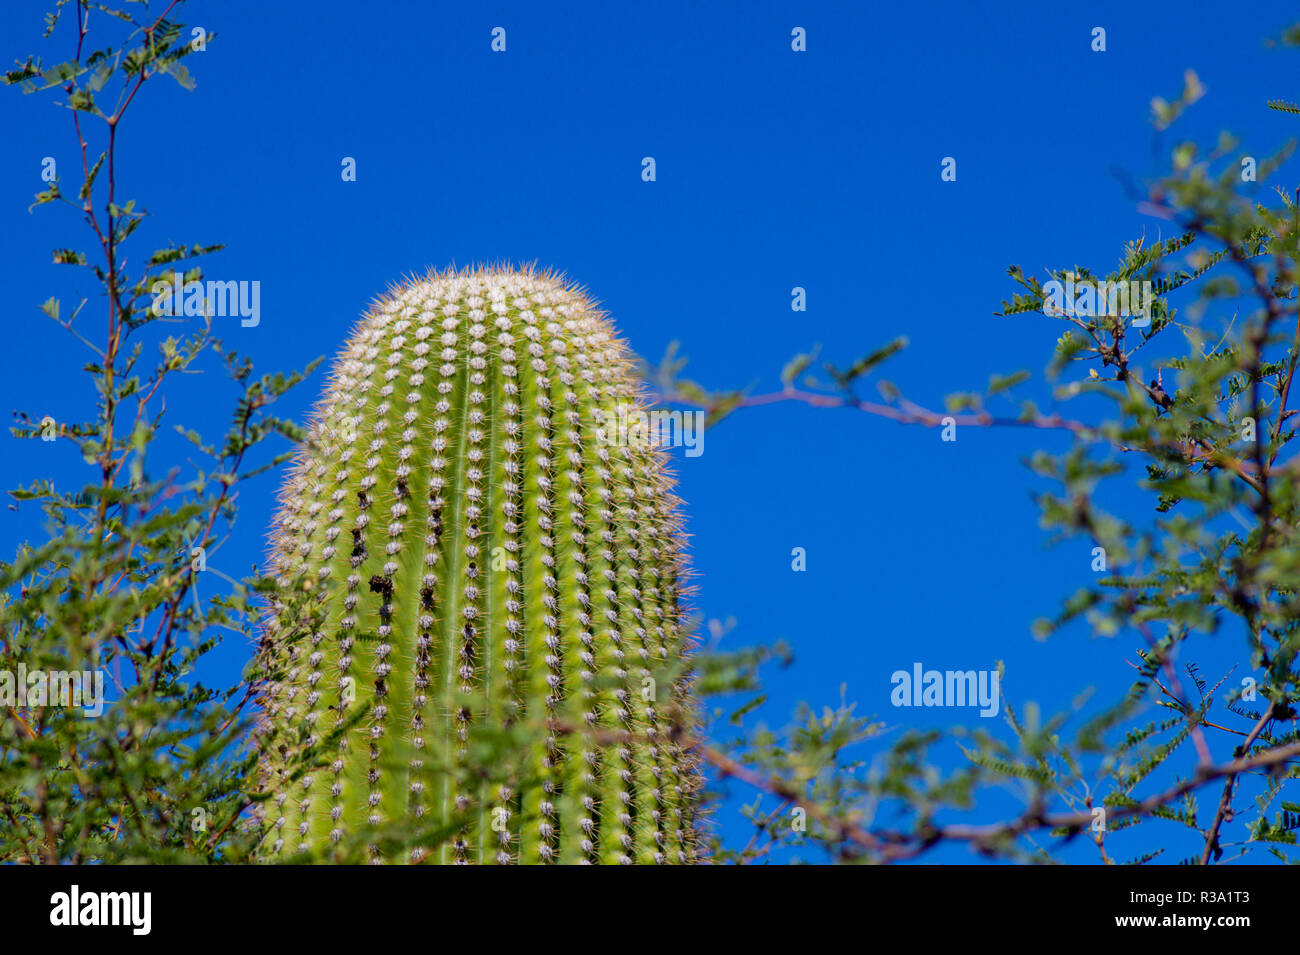 Saguaro Kaktus vor blauem Himmel Stockfoto